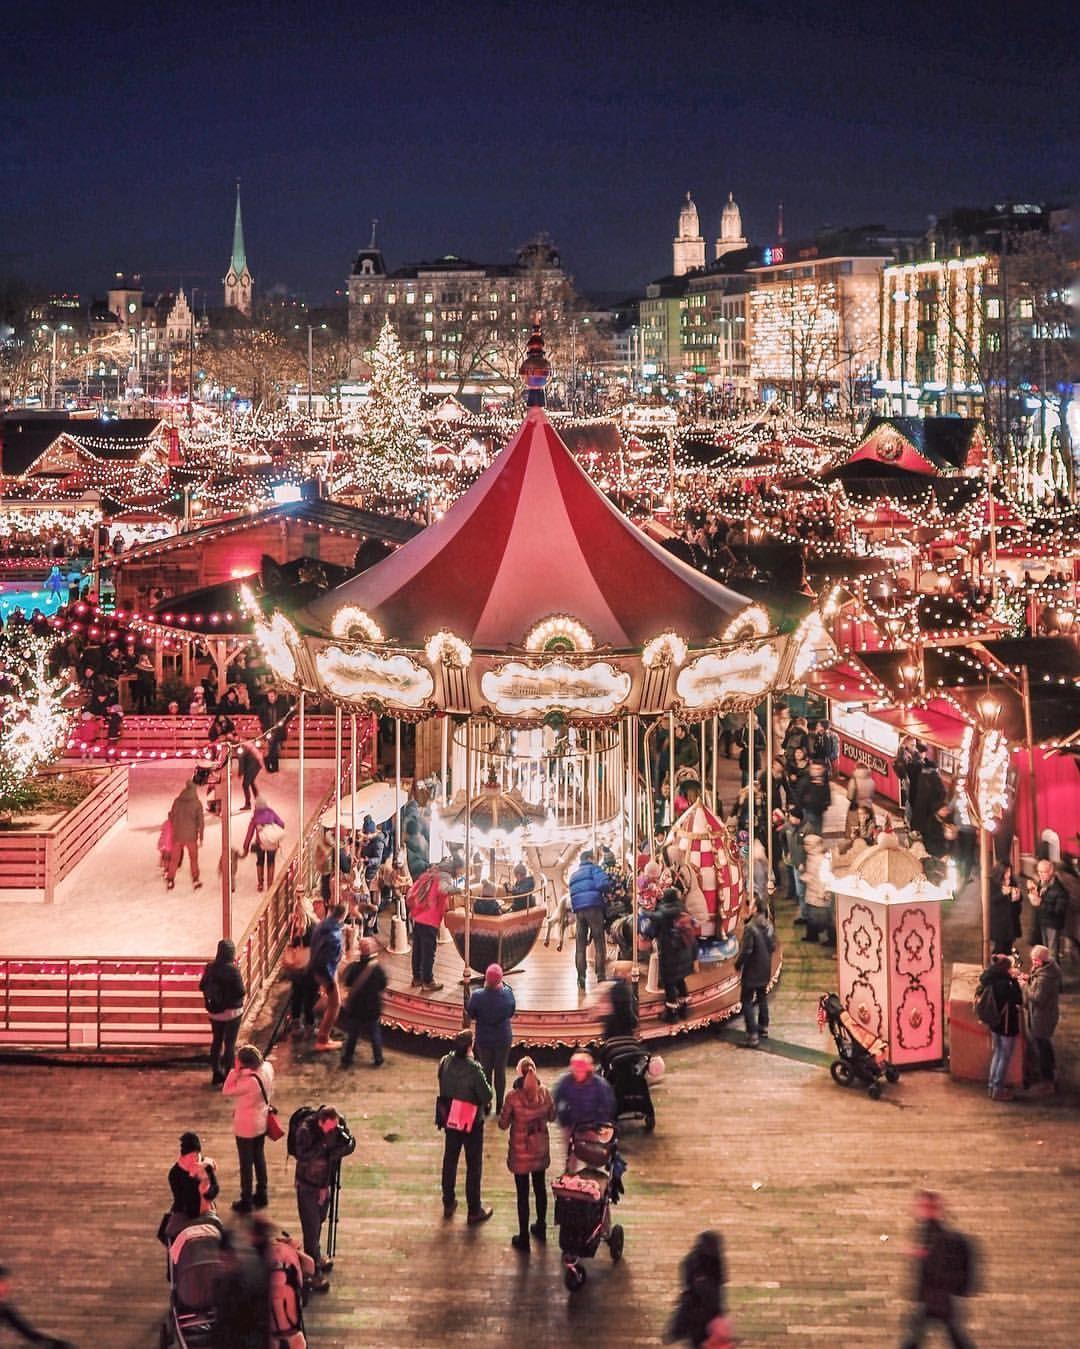 Christmas Market At The Opera House In Zurich Christmas Travel Destinations Switzerland Christmas Switzerland In Winter